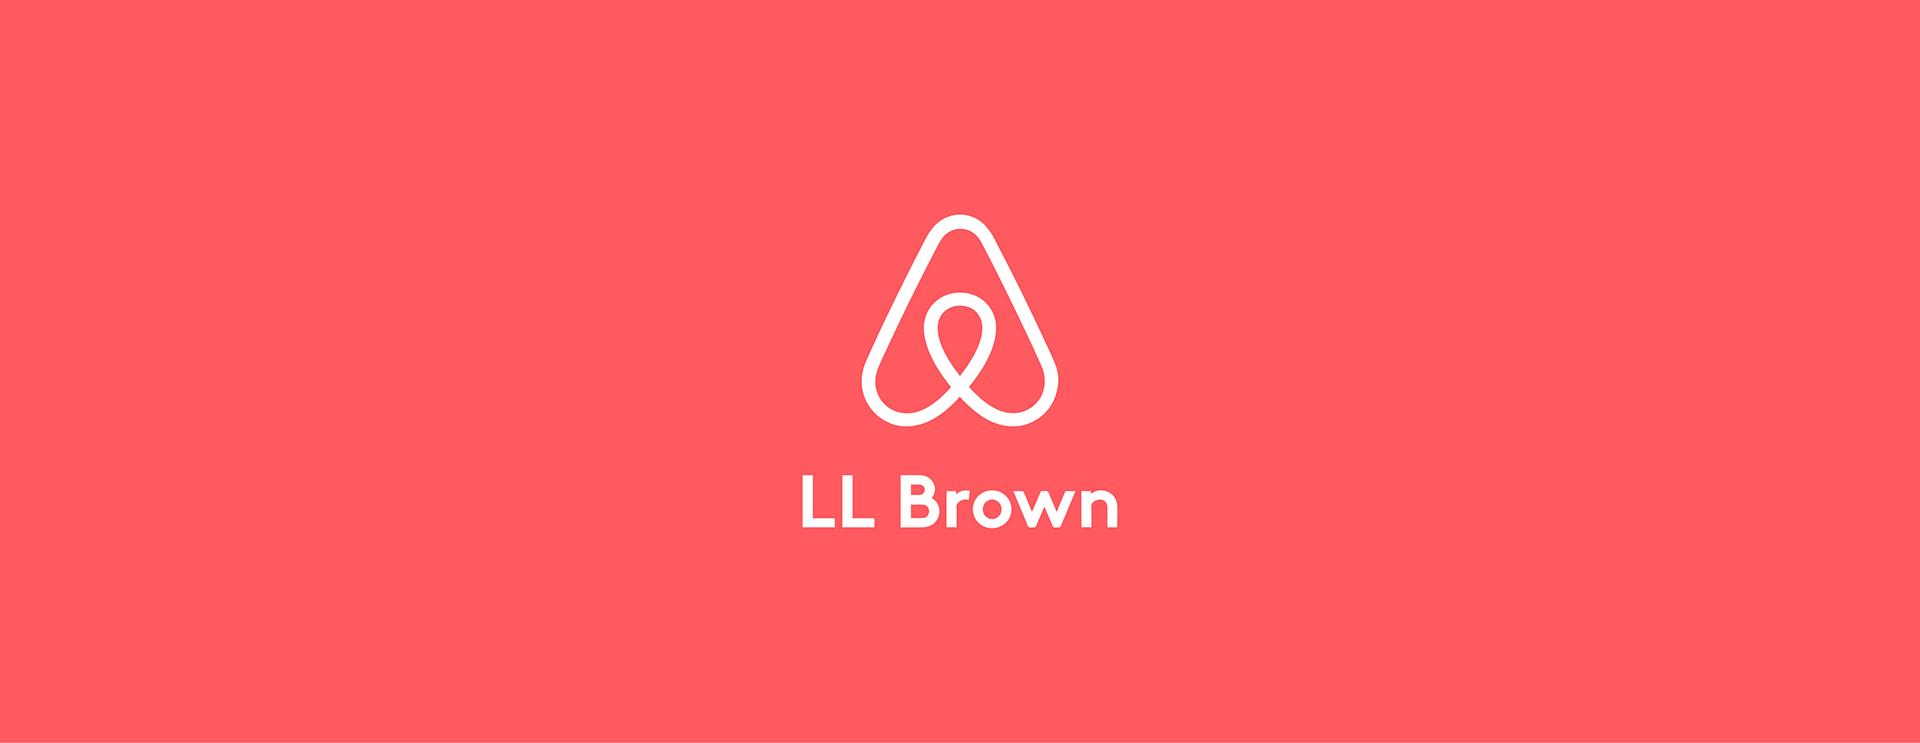 logo-fonts-design-brands-creative-8